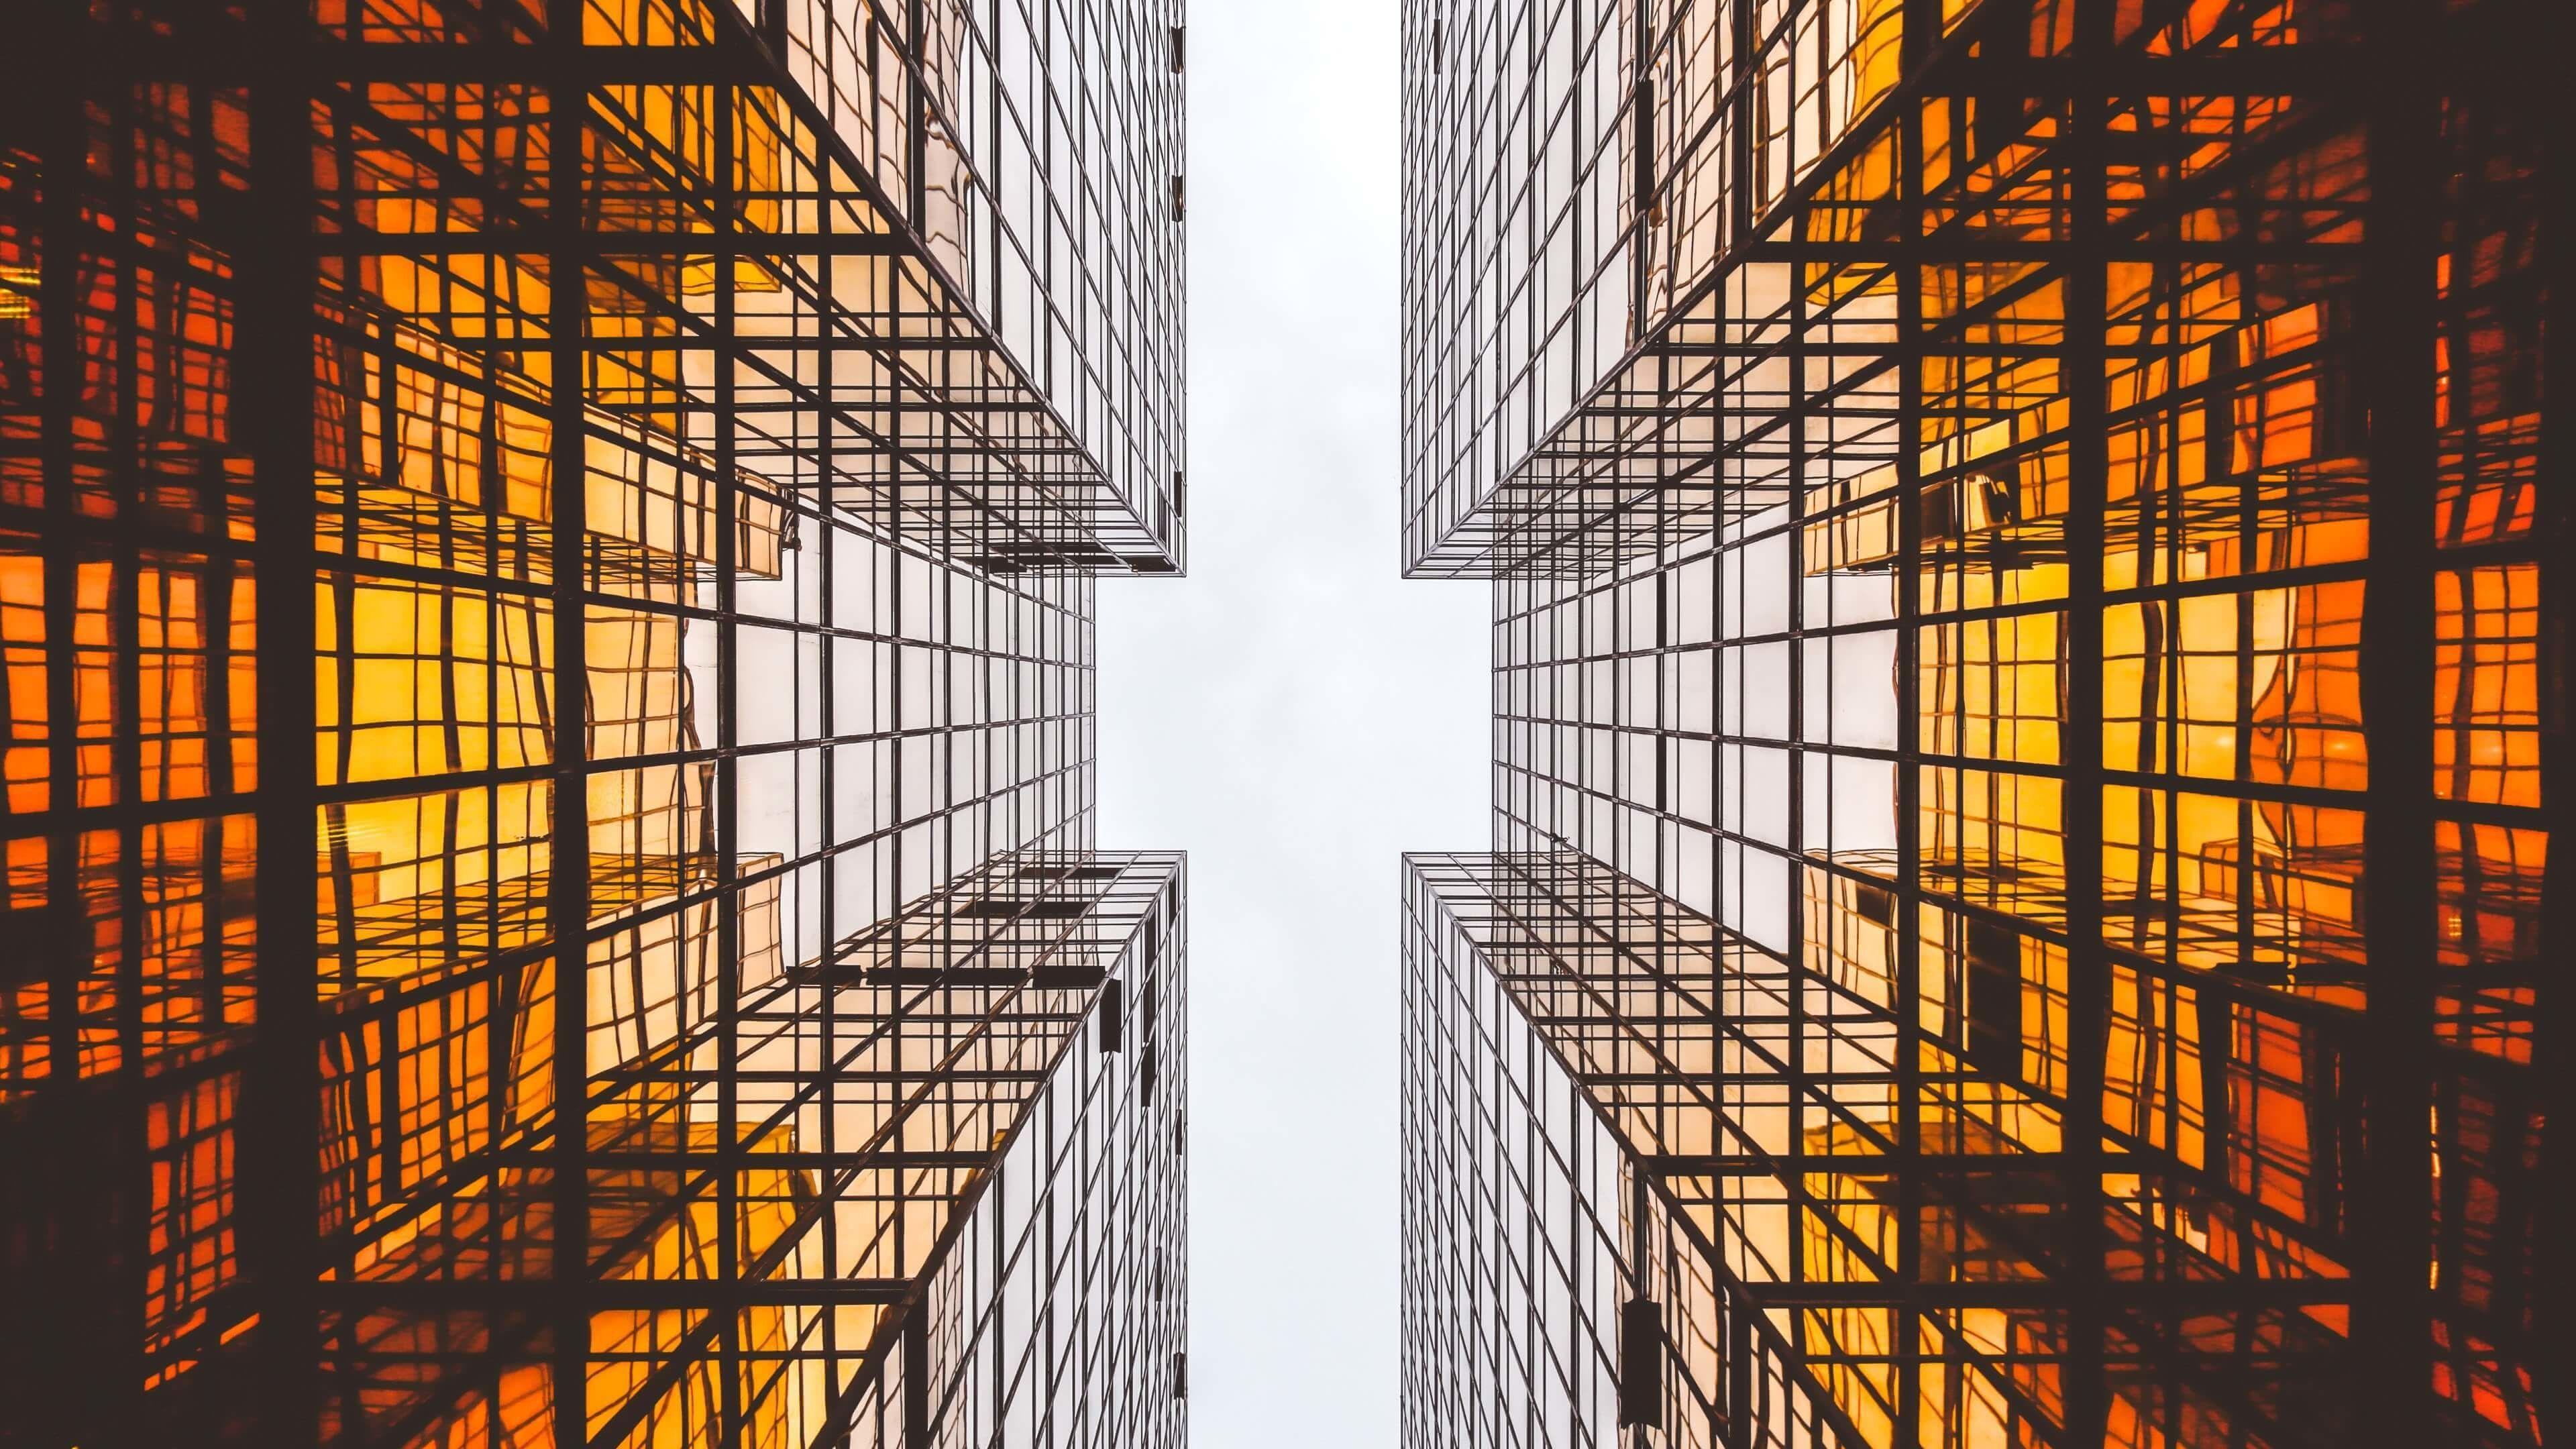 Modern Architecture Glass Skyscrapers 4k Wallpaper Desktop